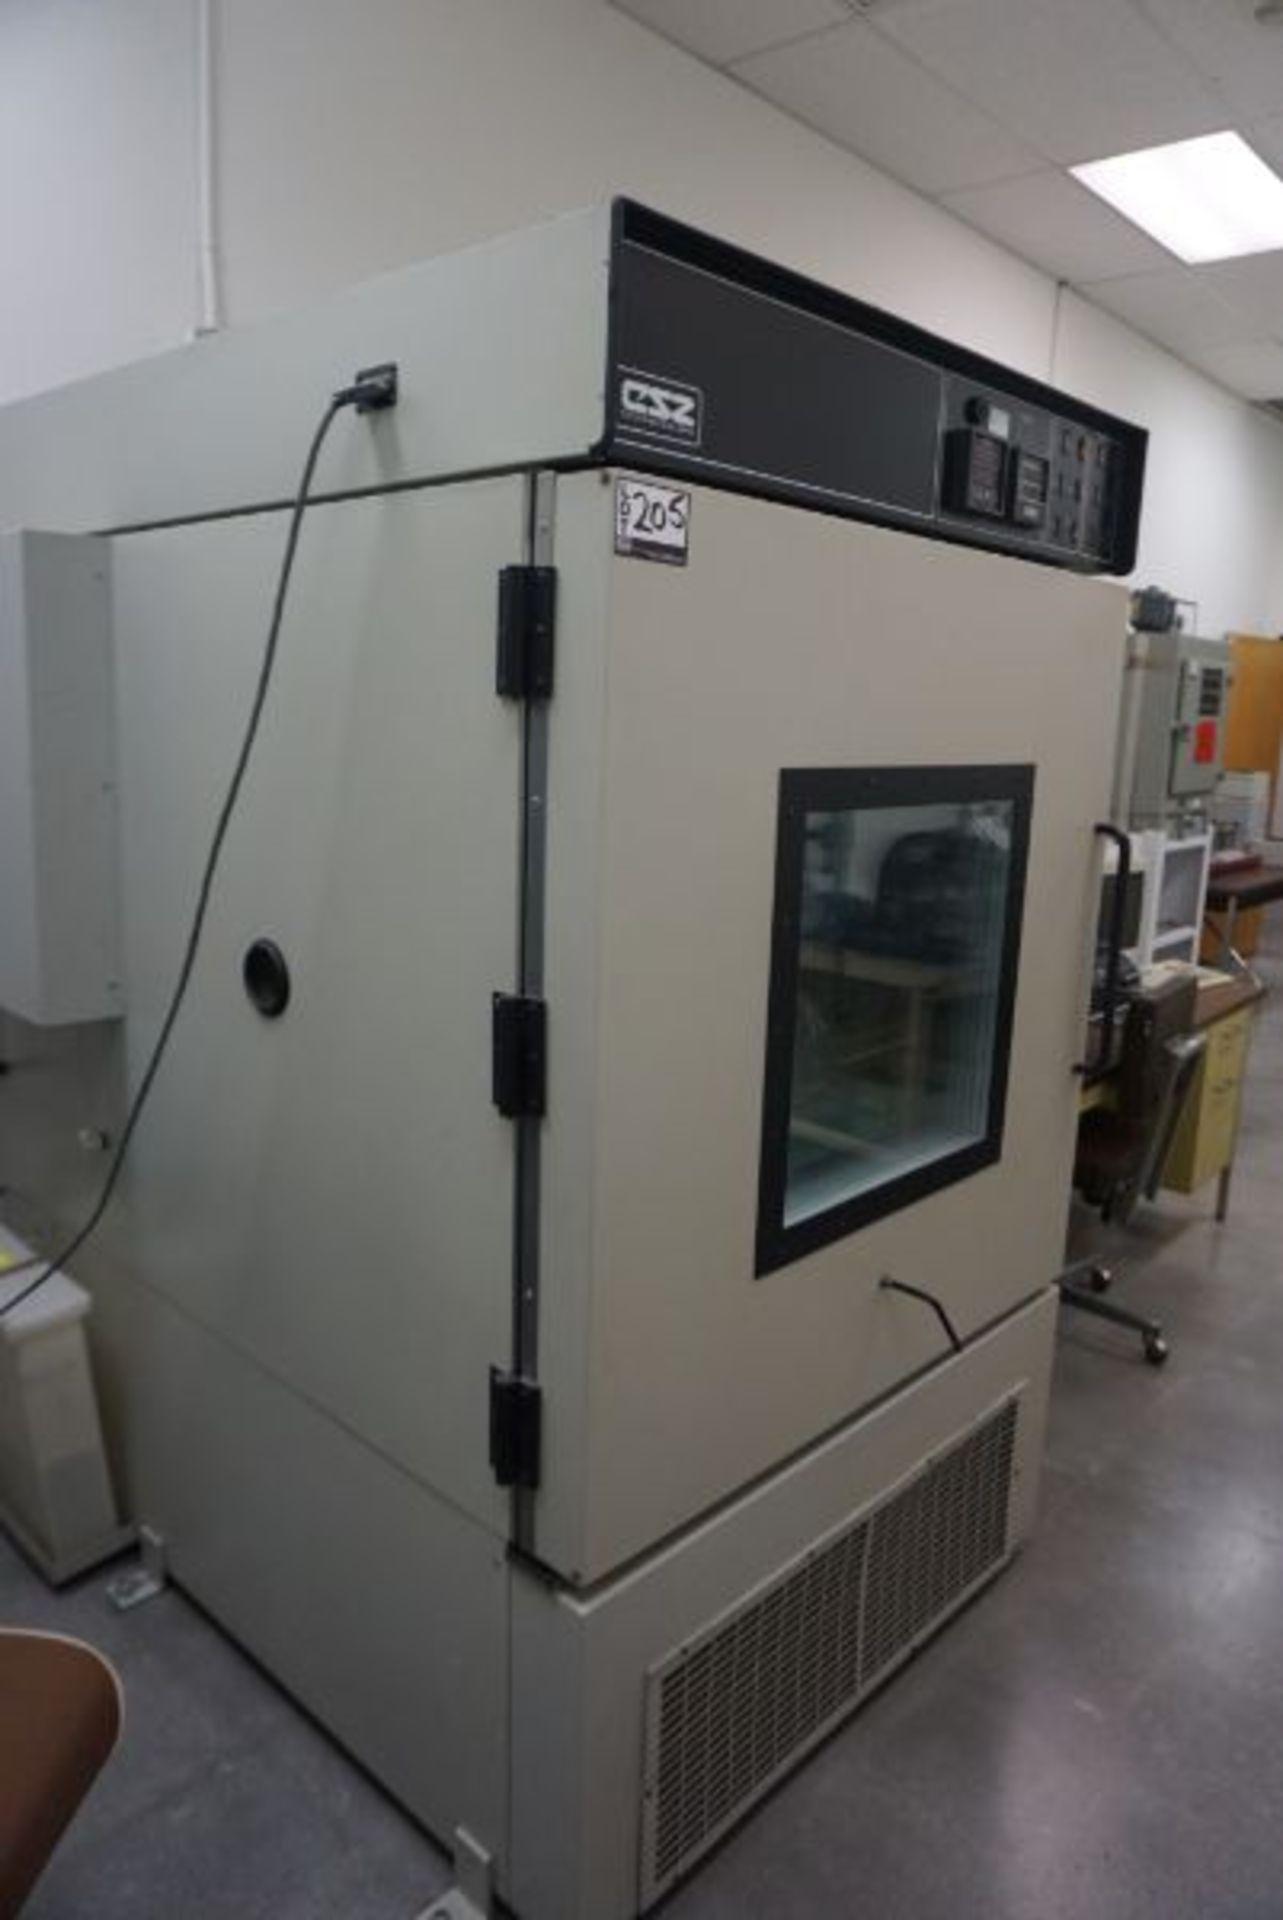 Cincinnati Sub-Zero Environmental Test Chambers - Image 2 of 3